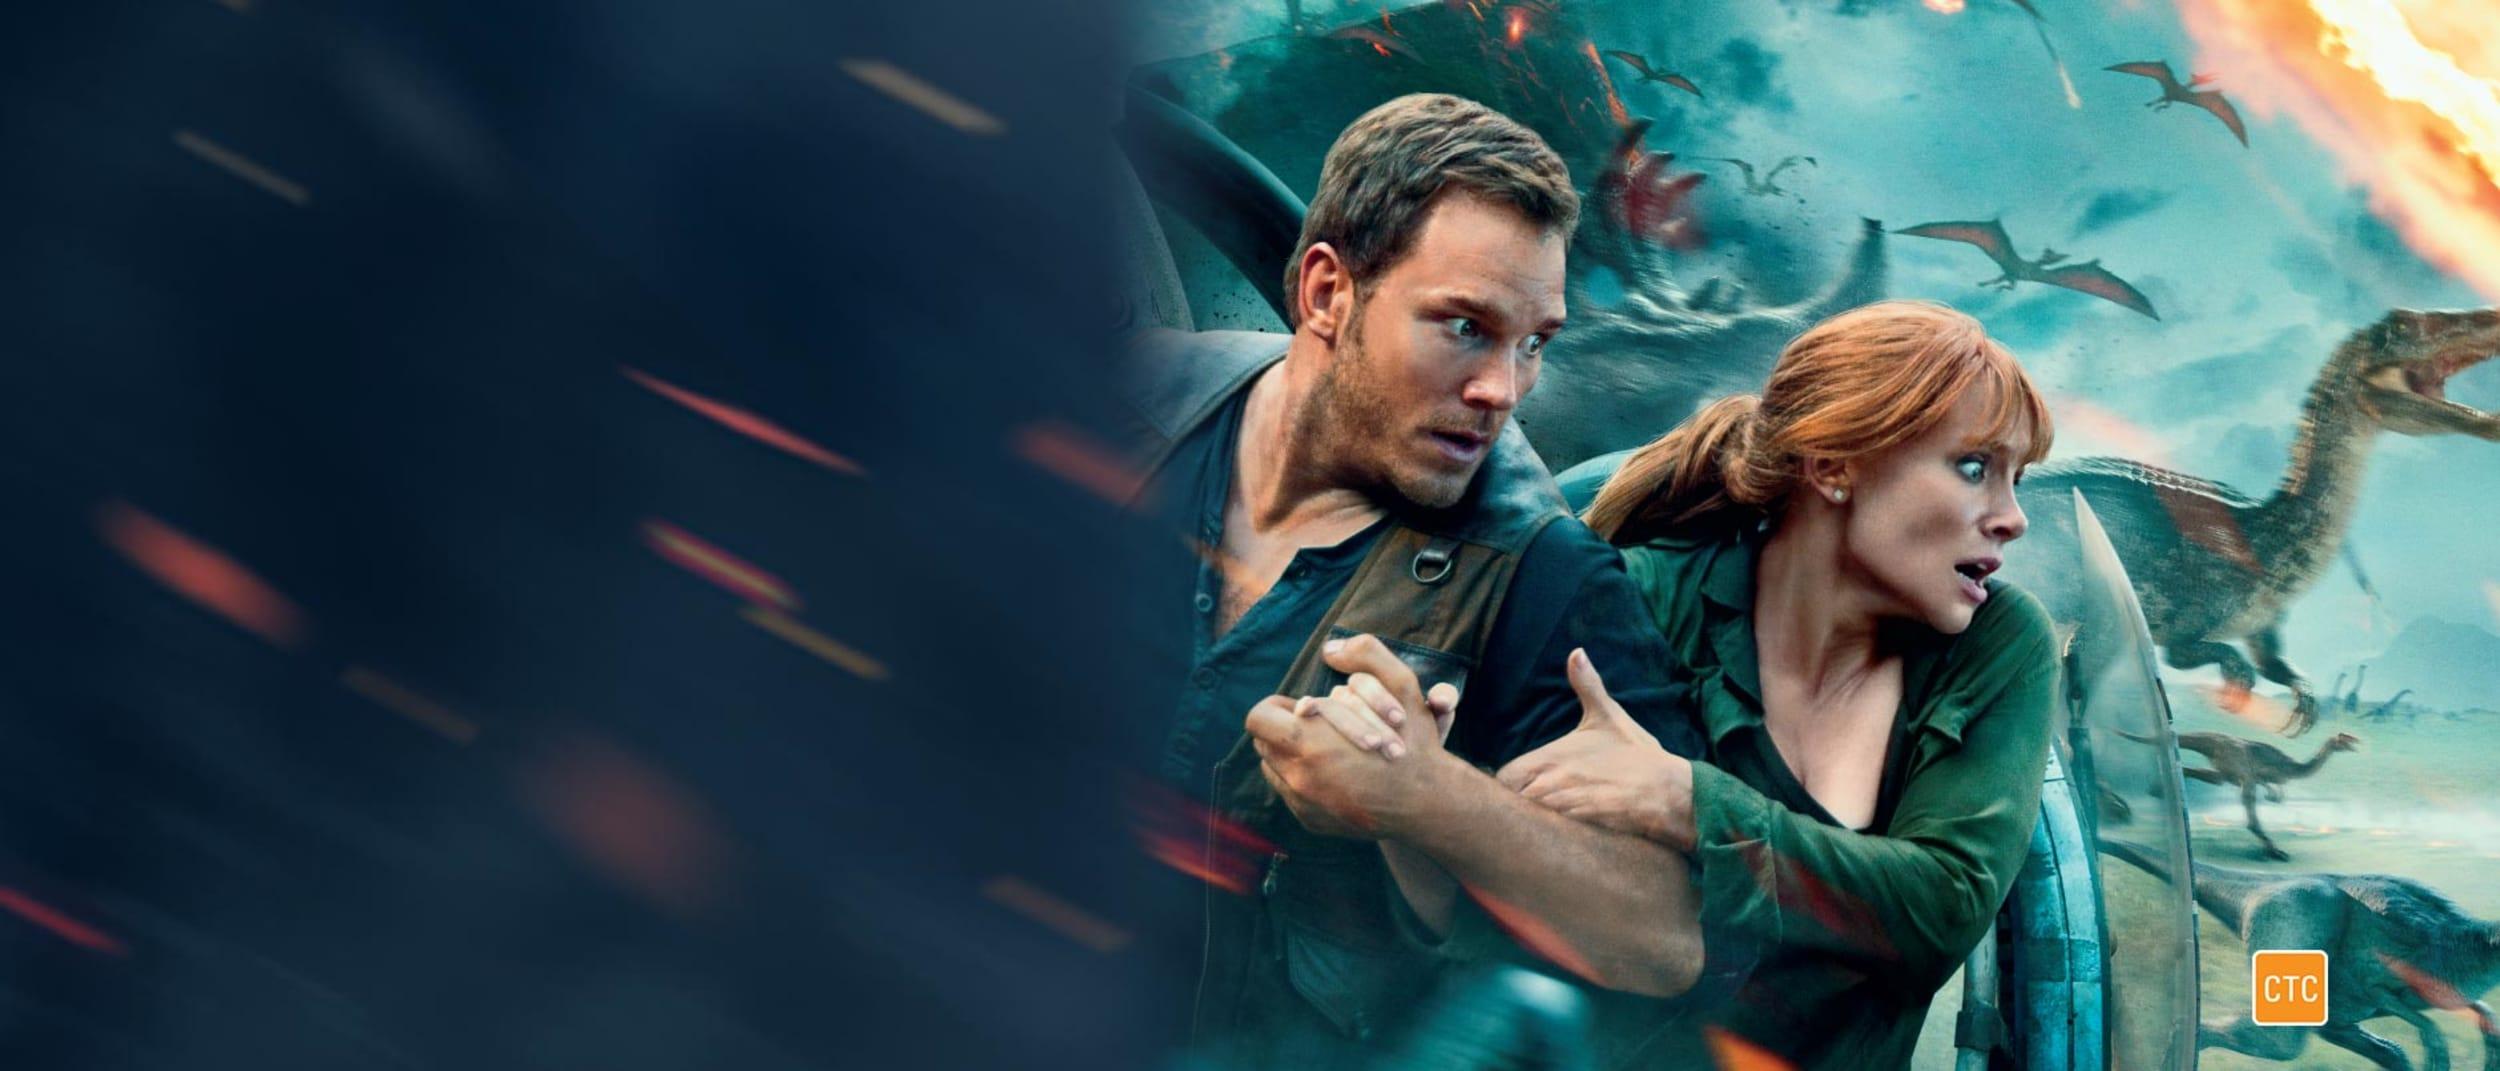 HOYTS: Advance Screening of Jurassic World: Fallen Kingdom